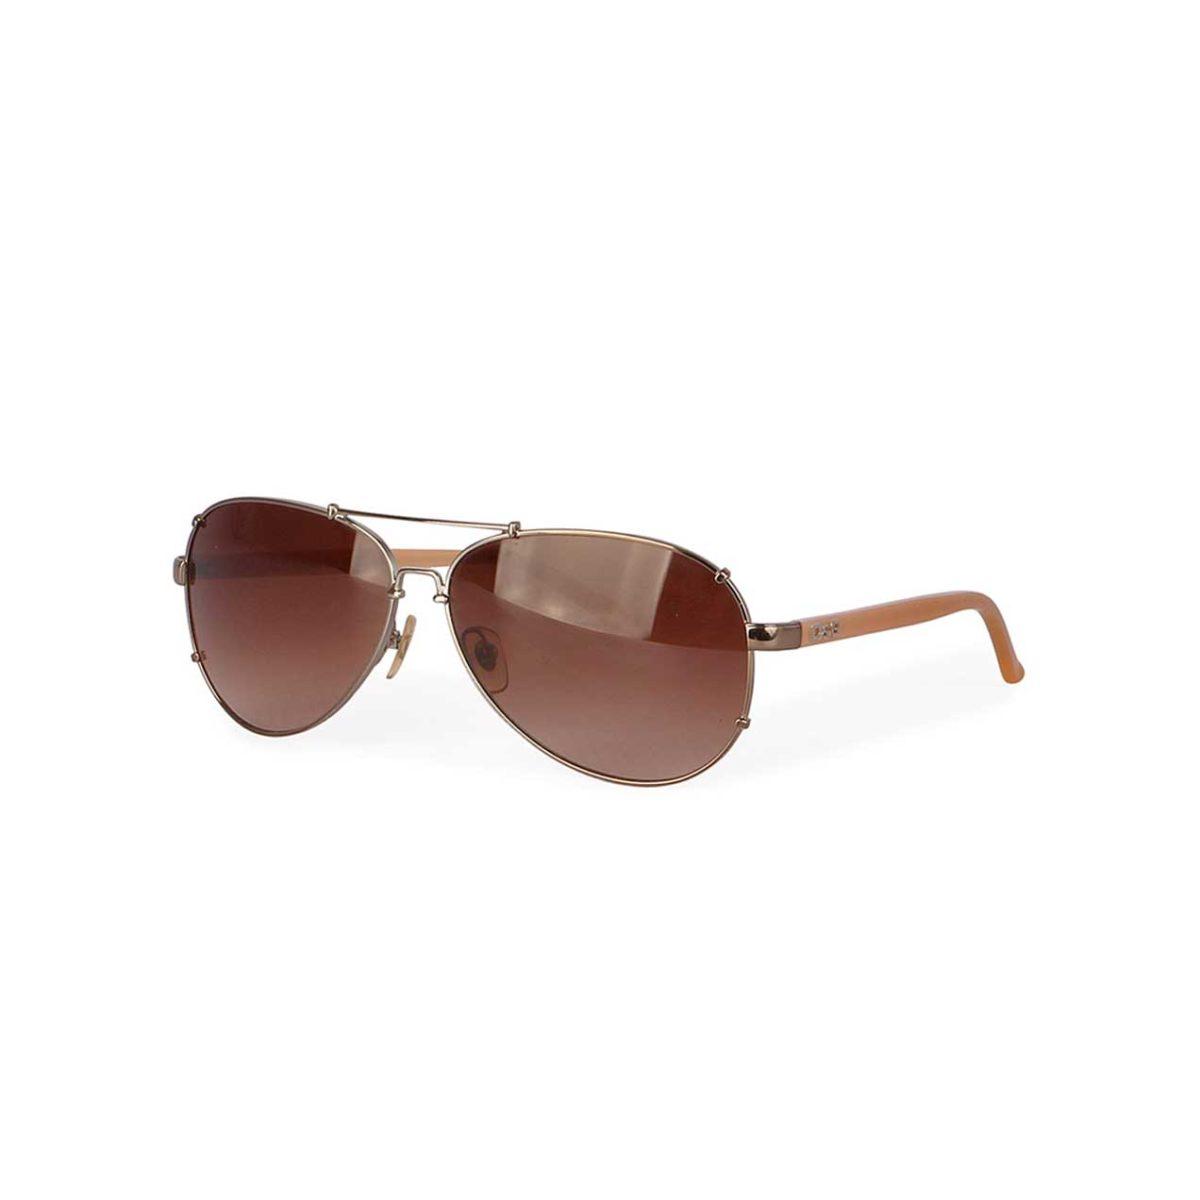 db1293721af2 Dolce   Gabbana Sunglasses Online India